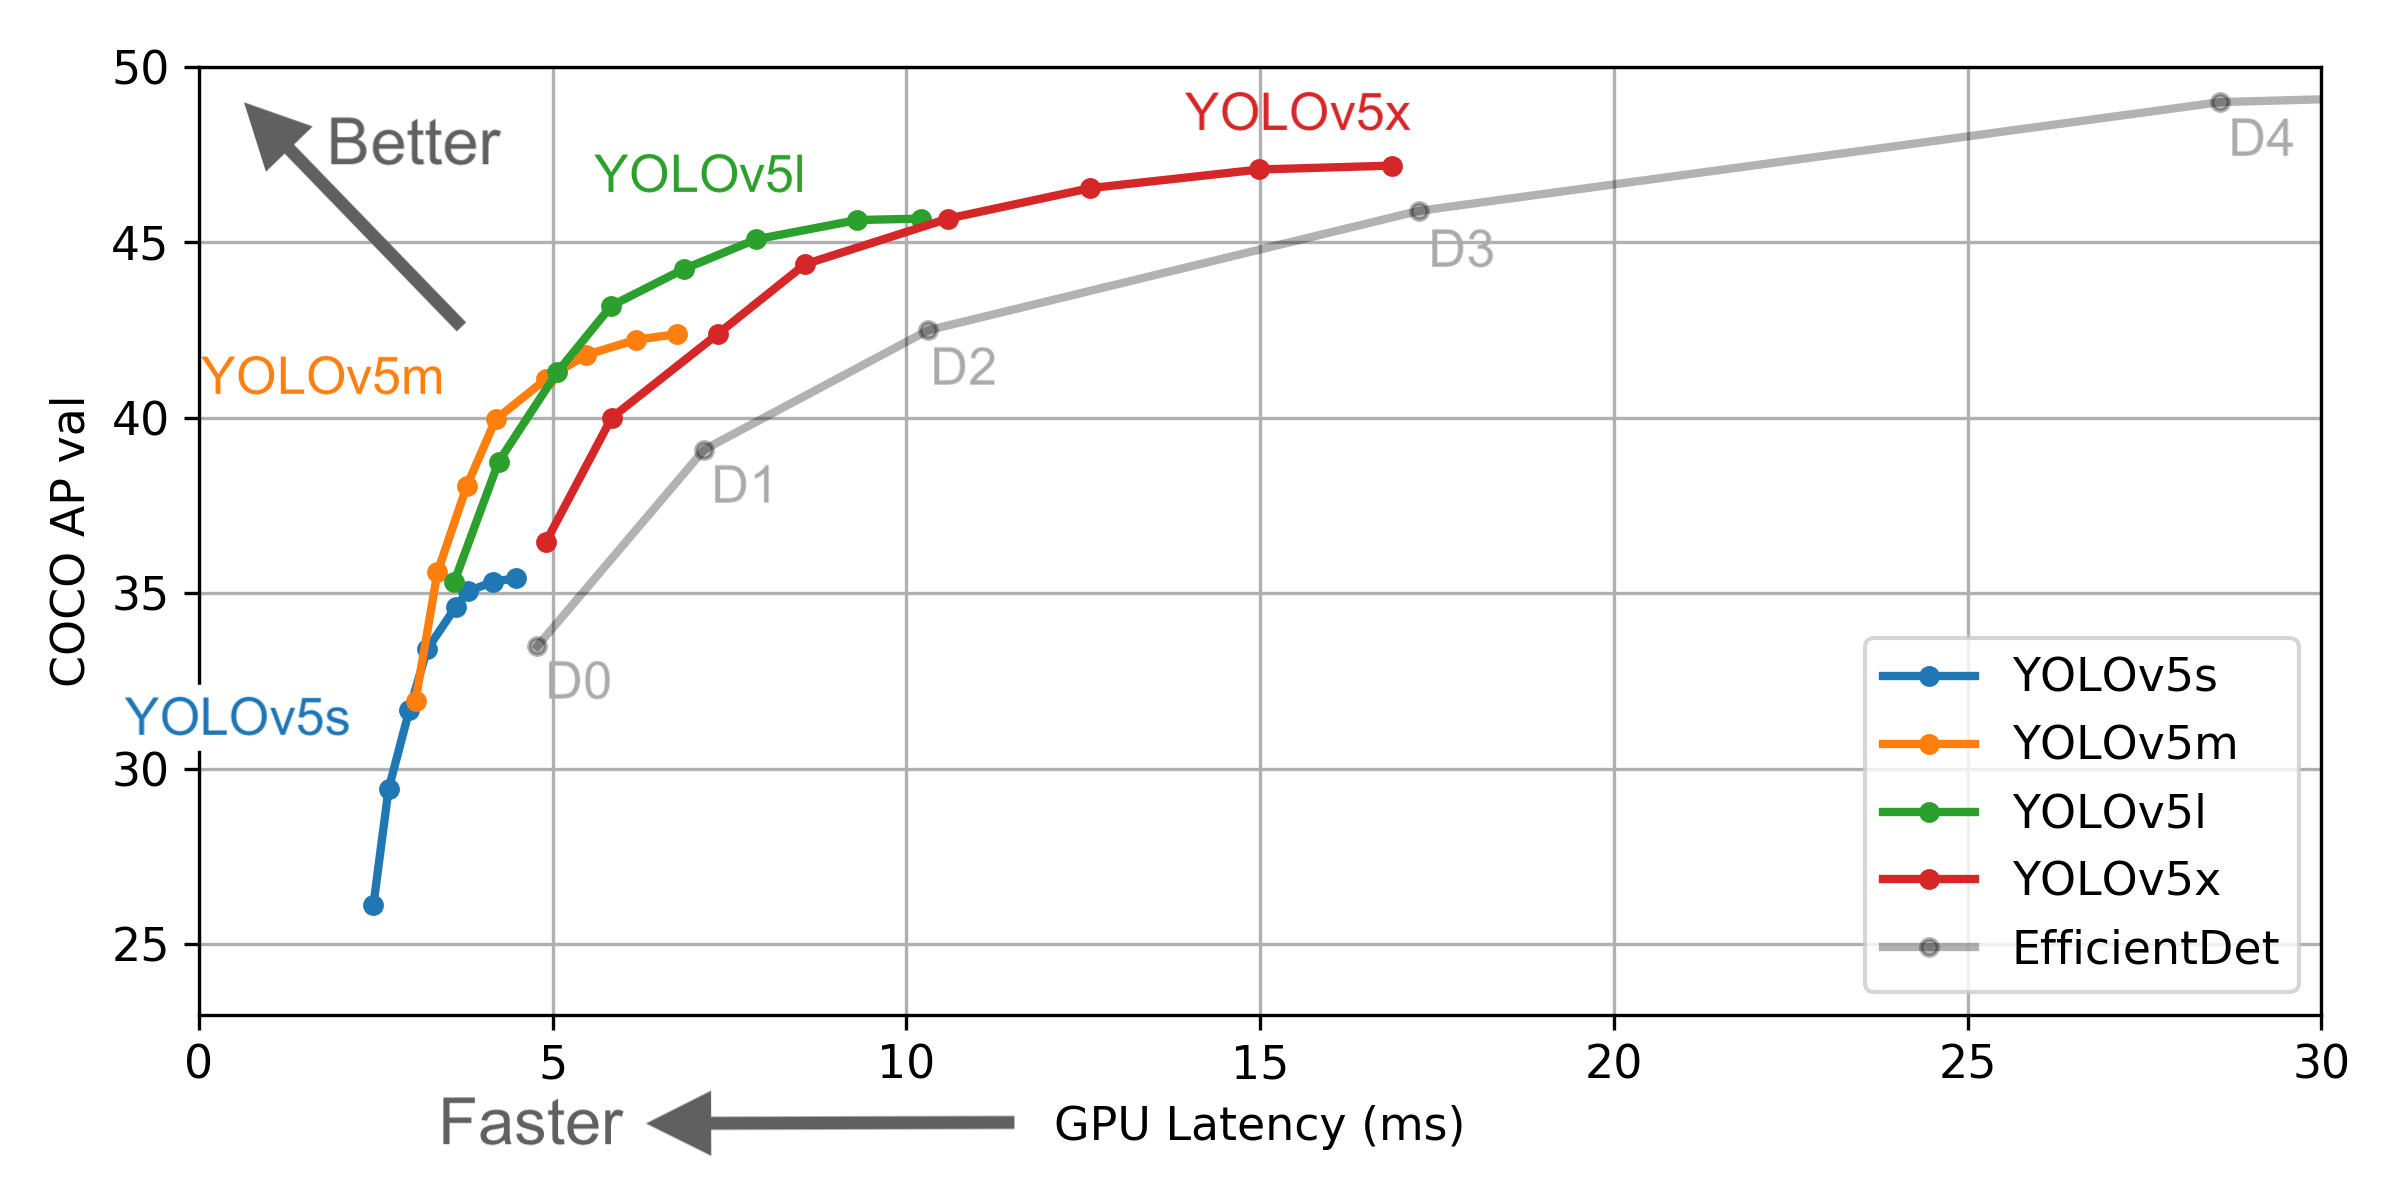 COCO AP val vs GPU latency (ms) for YOLOv5s, YOLOv5m, YOLOv5l, YOLOv5x, EfficientDet.